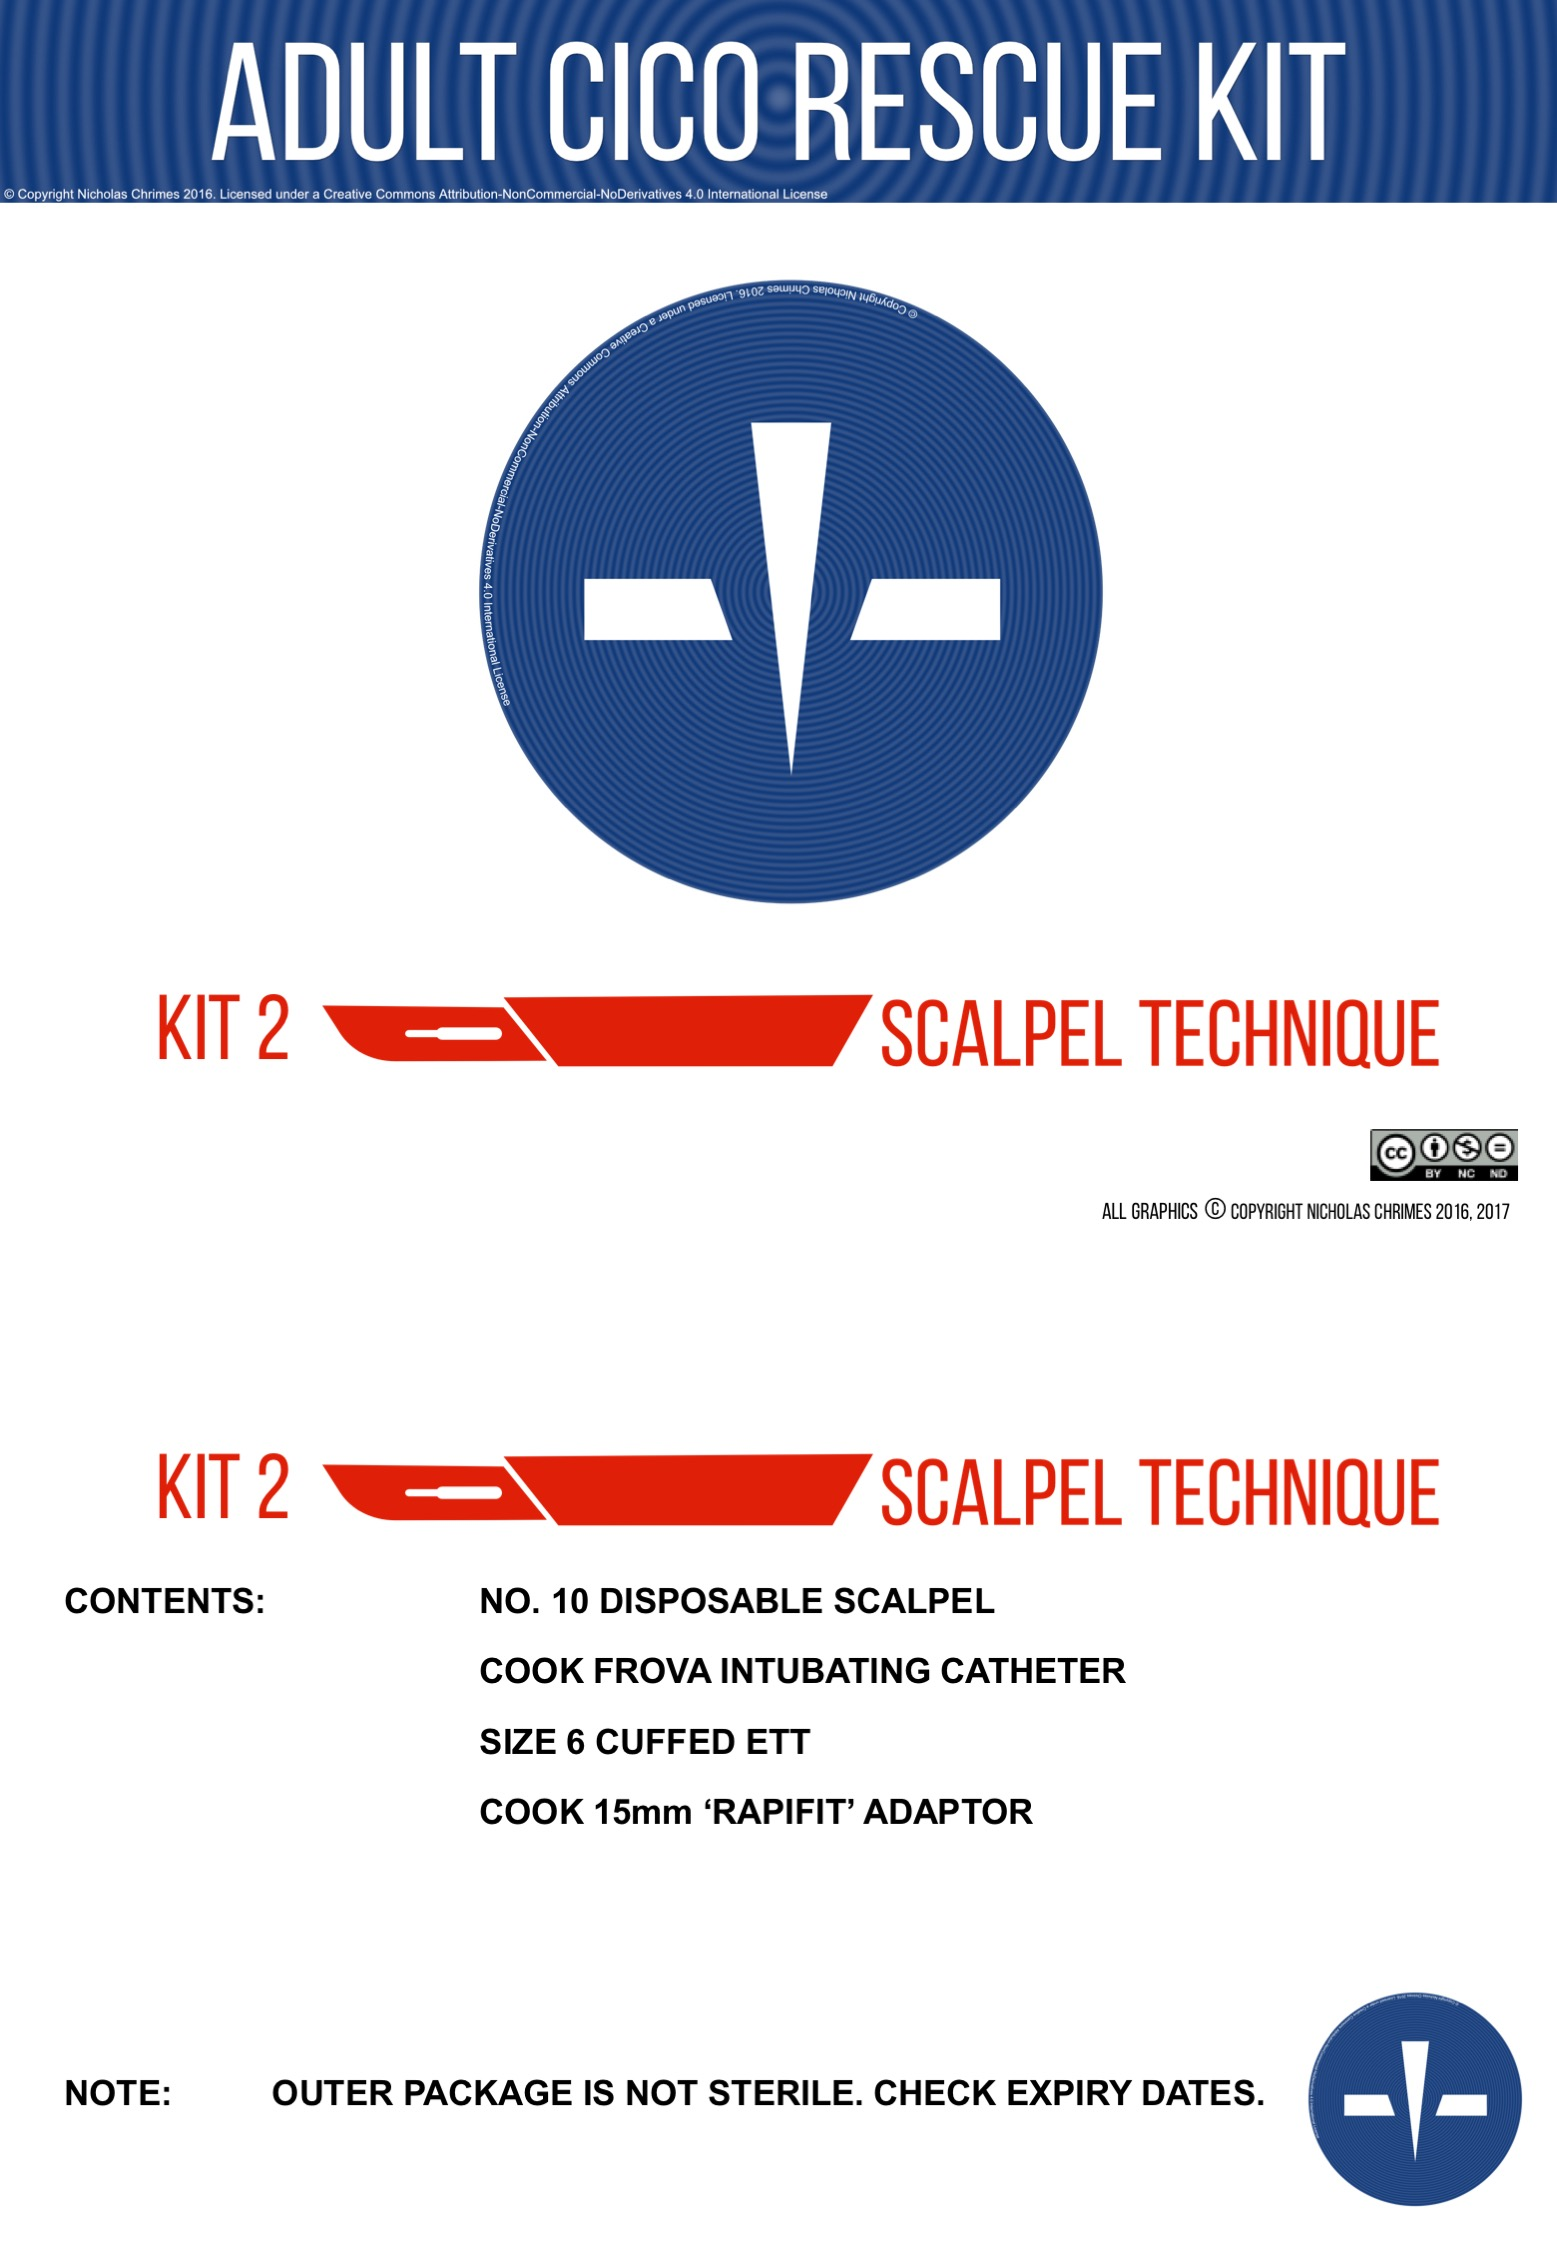 Adult CICO Rescue Kit - Complete Labels & Contents